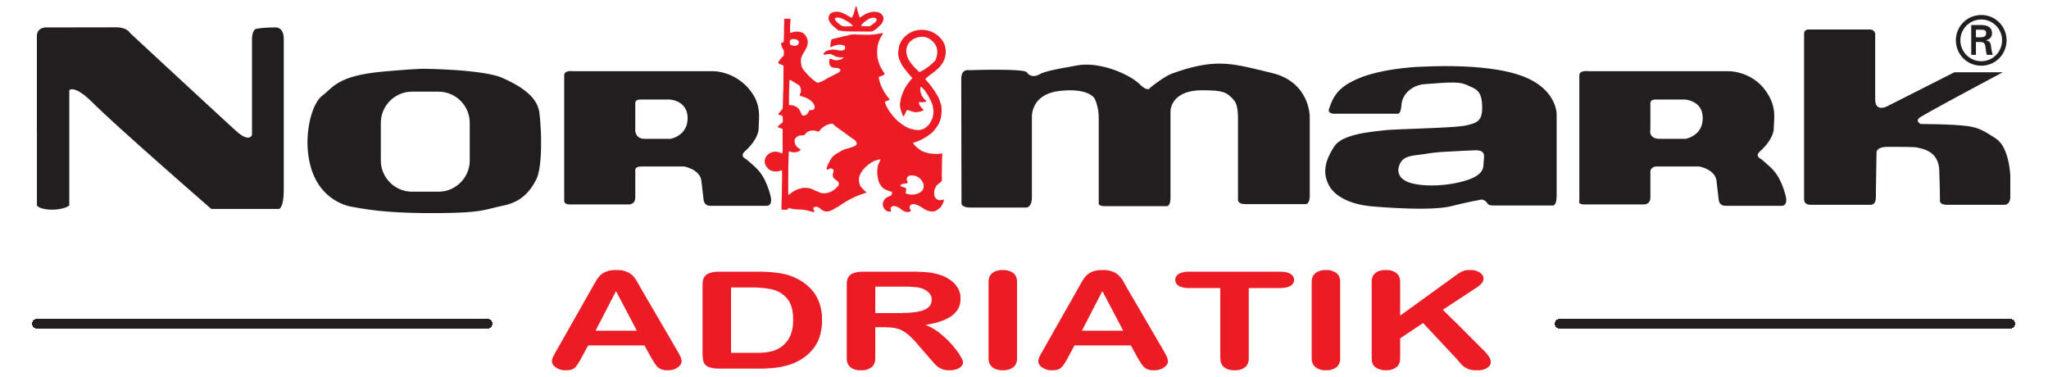 Saznajte više na stranicama Normark Adriatik/></a></center></p> <p>Ribolovna oprema Interland</p> <p><center><a href=